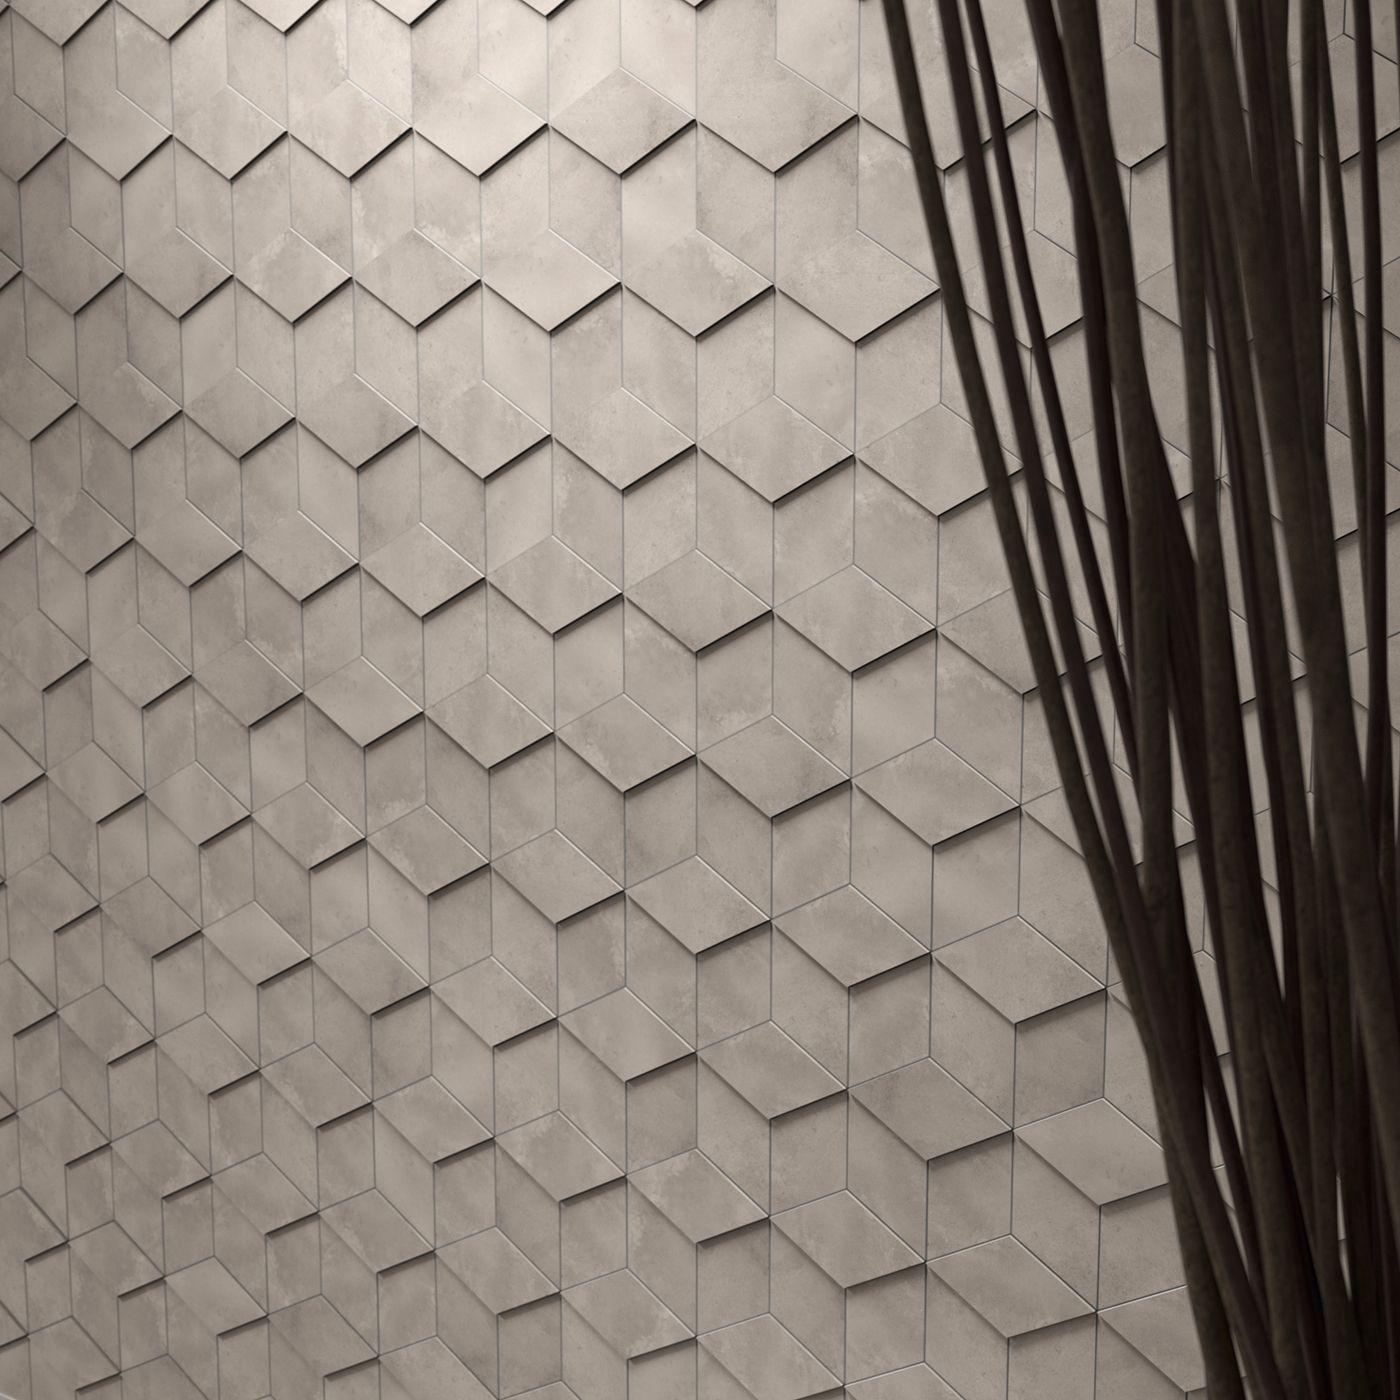 Uni Globe Salle De Bain ~ carrelage d int rieur mural en gr s c rame uni globe